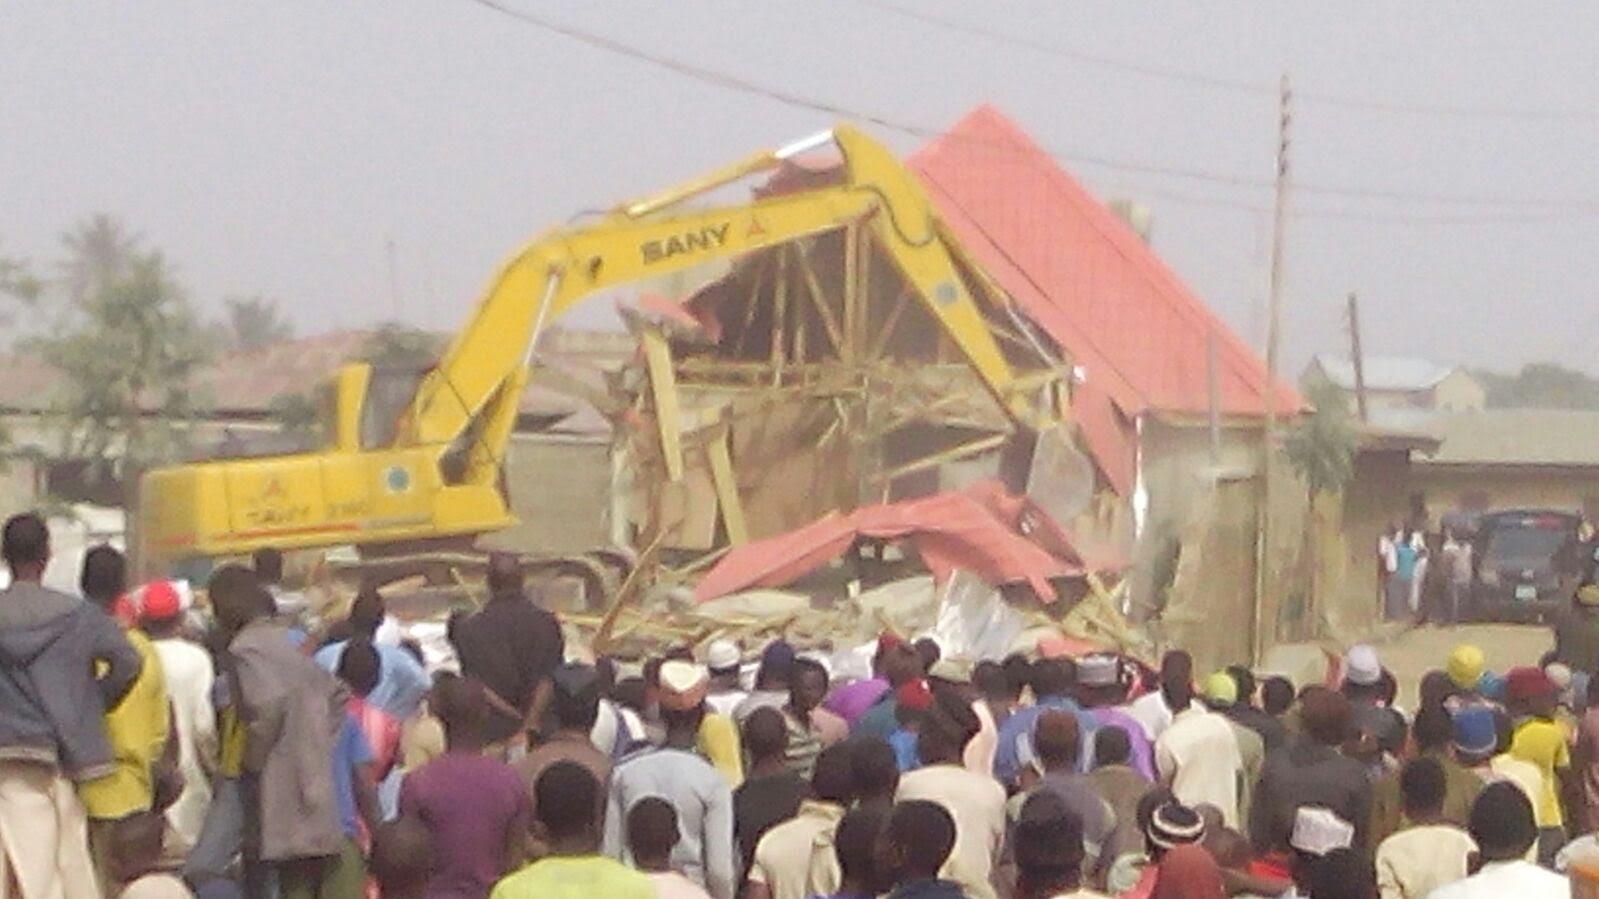 Zakzaky Homes Demolished